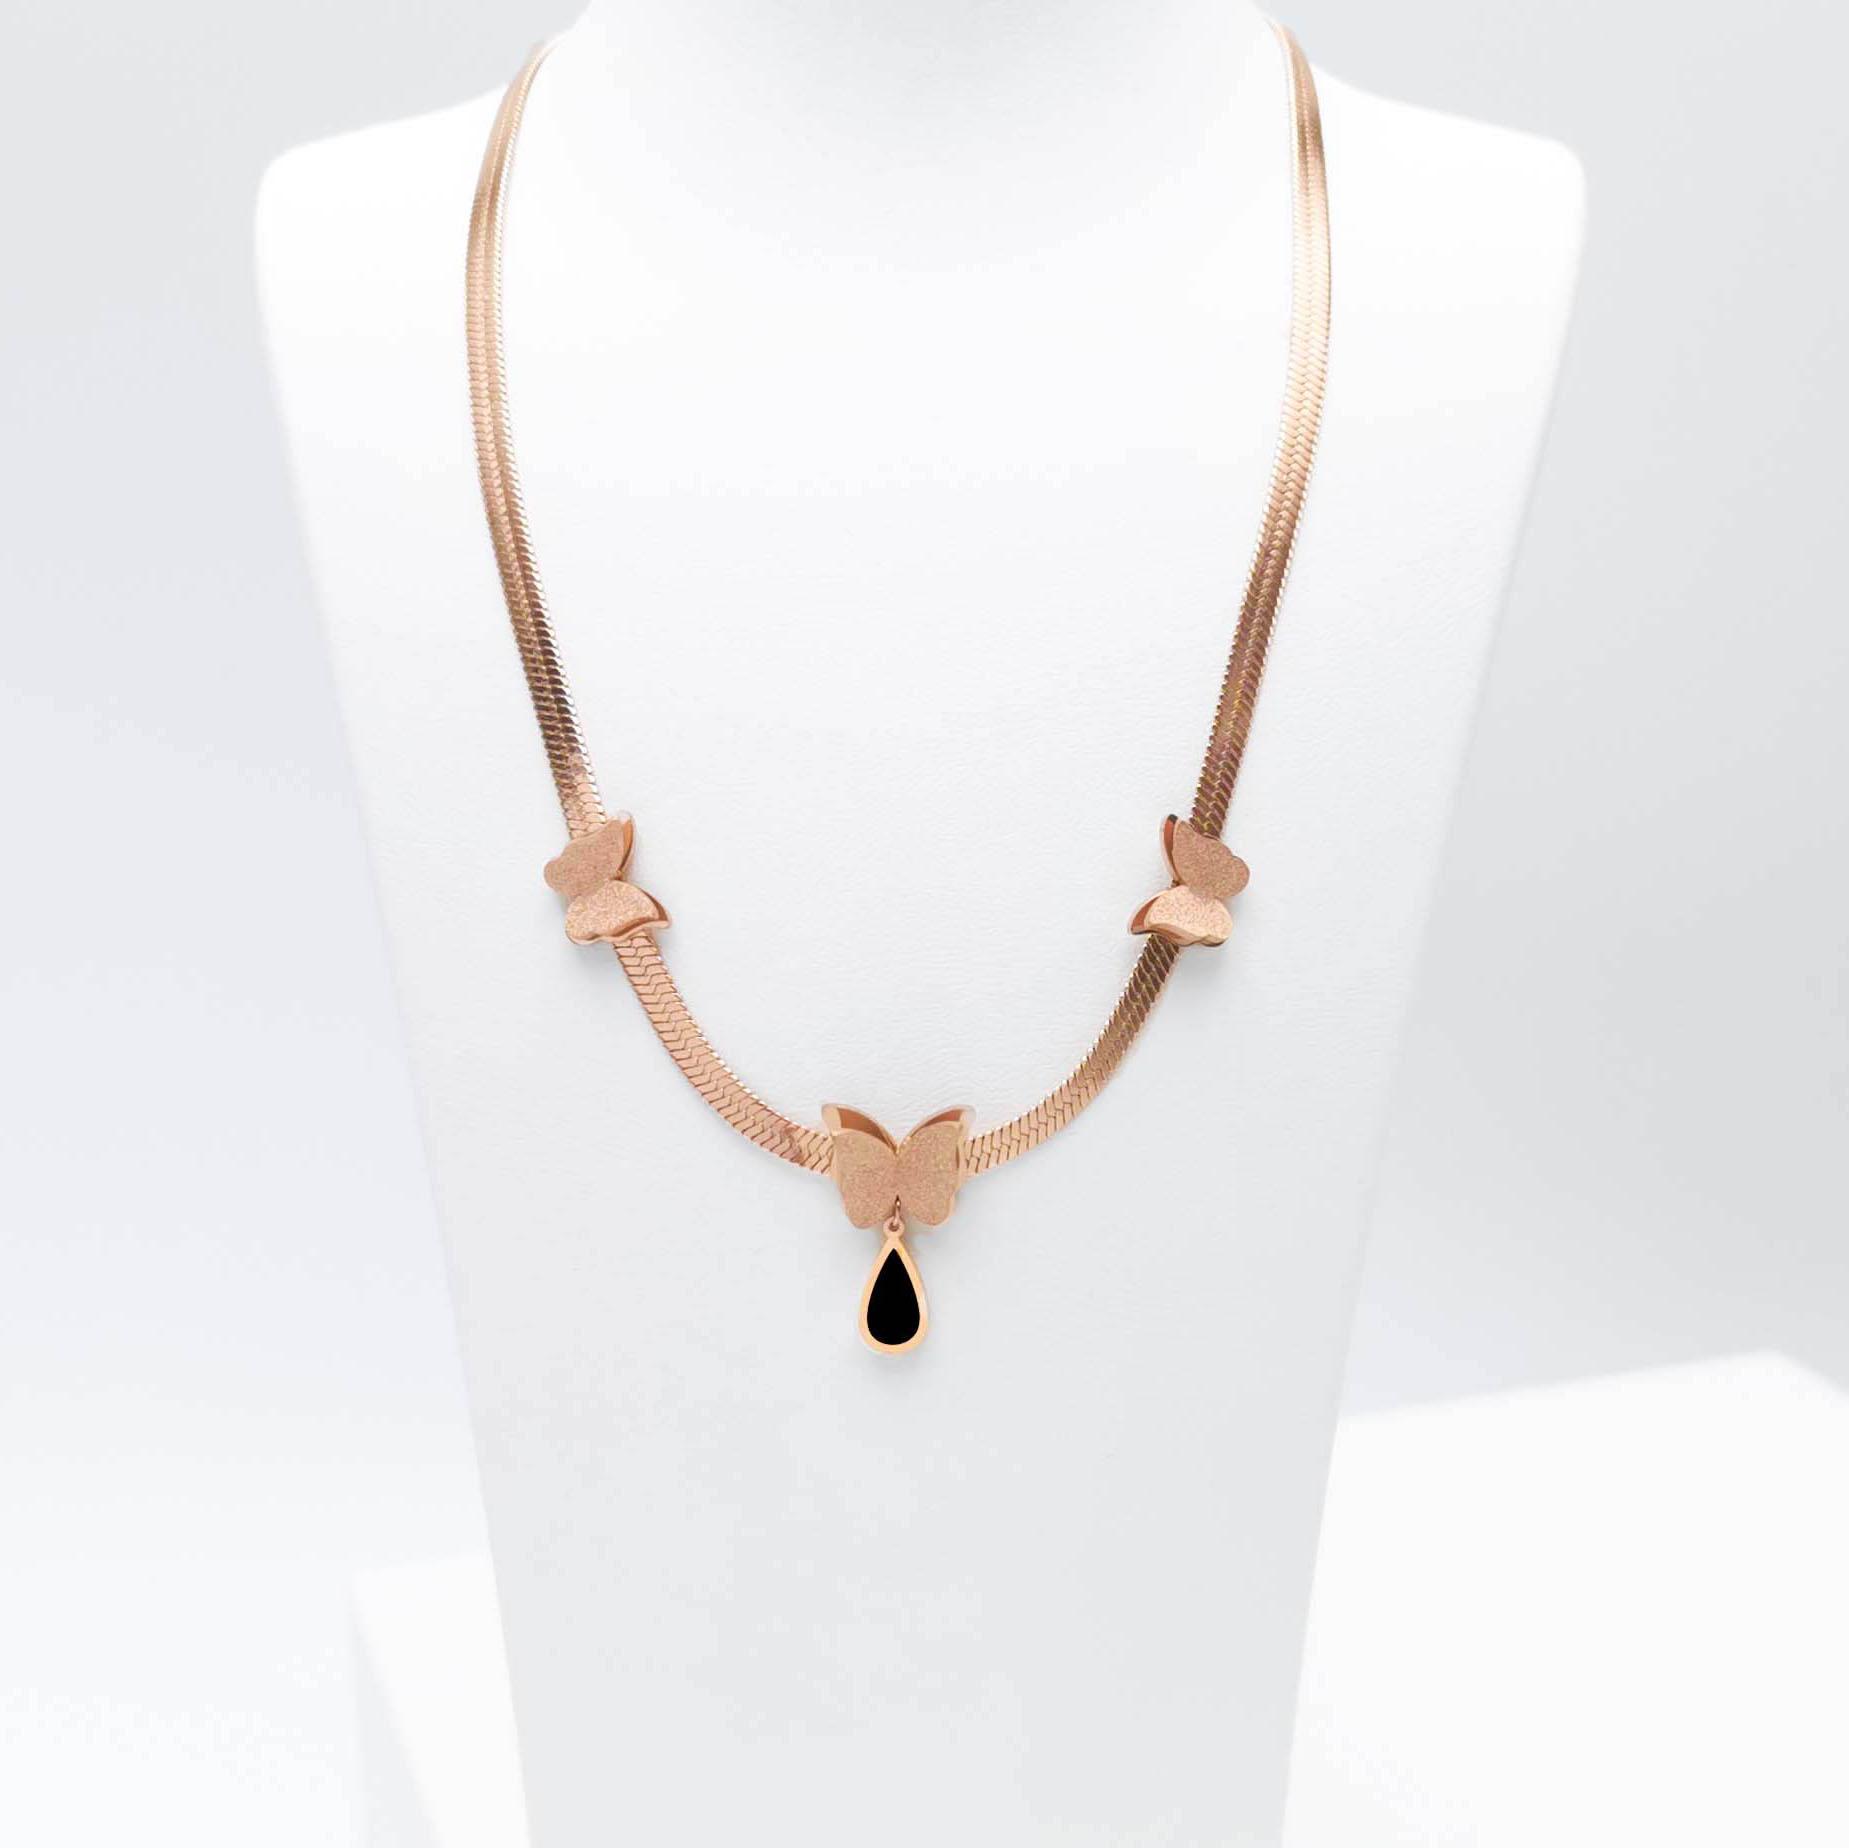 Queen Butterfly Ultimate Beauty bild 1 Dam halsband. Modern, stilren och exklusive Smycke.